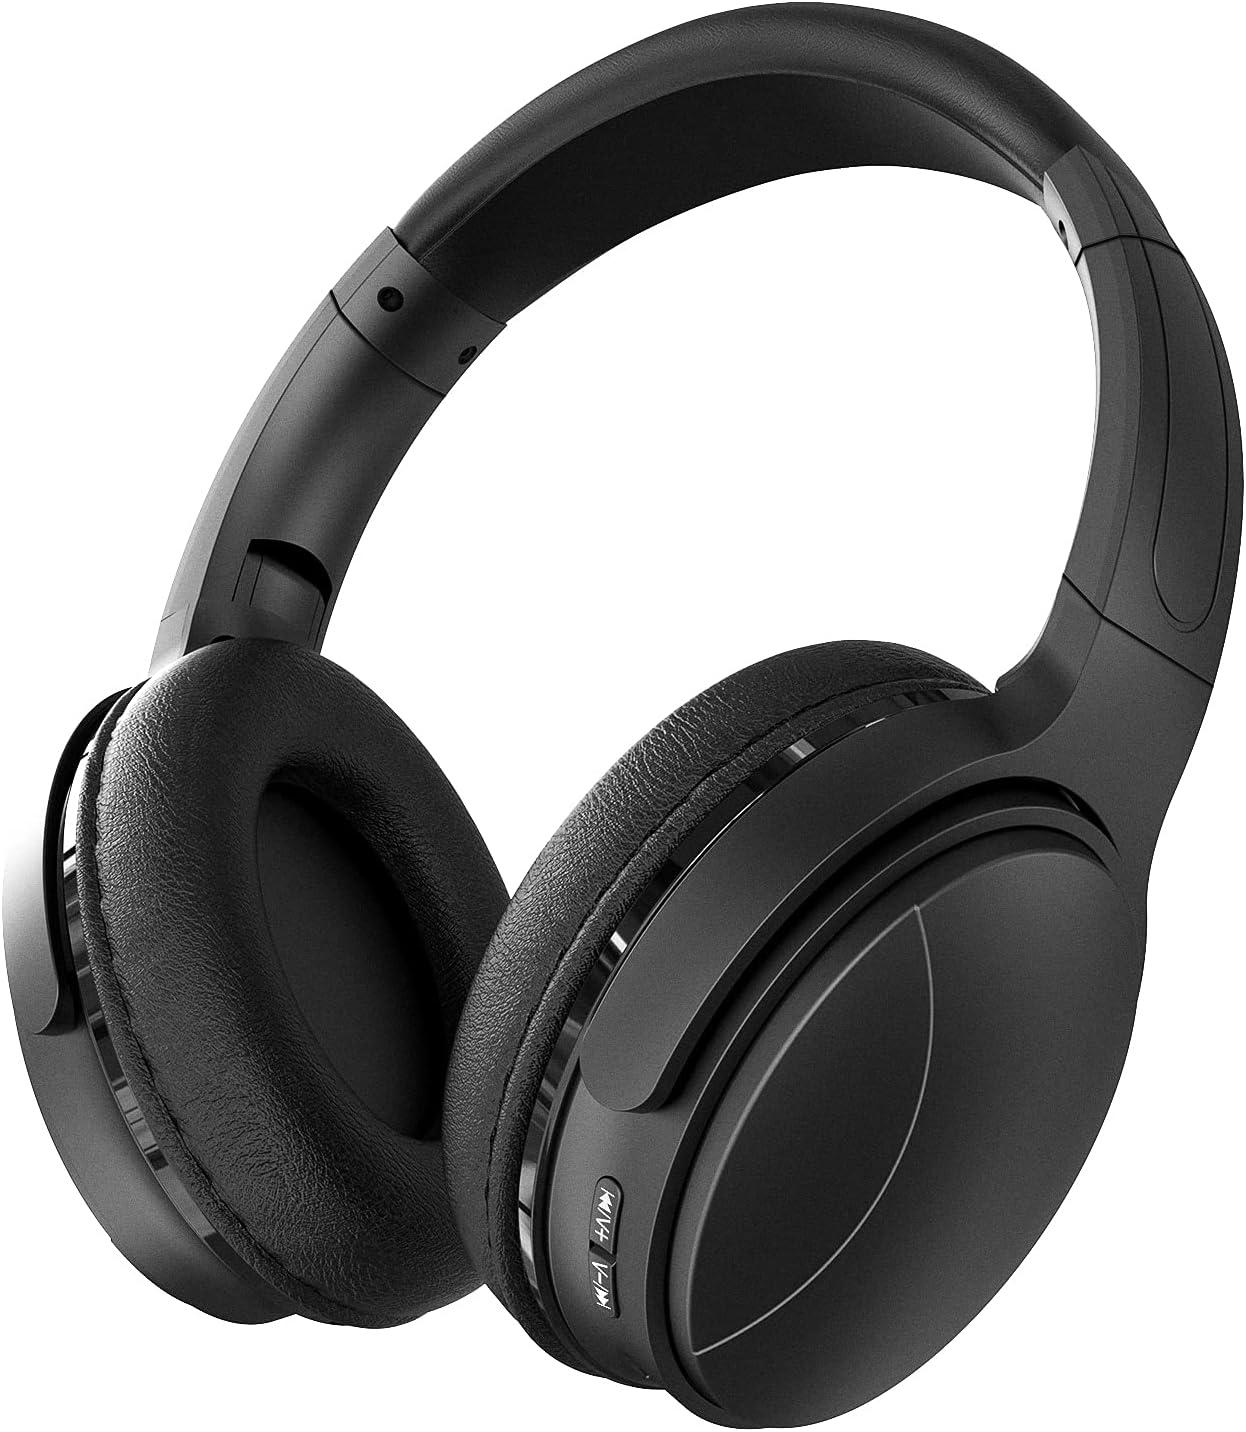 Auriculares Inalámbricos Cascos Bluetooth Cerrados Audifonos Diadema Plegables Graves Profundos Estéreo Inalámbricos Micrófono Incorporado Micro SD/TF, FM (para iPhone/Samsung/iPad/PC)